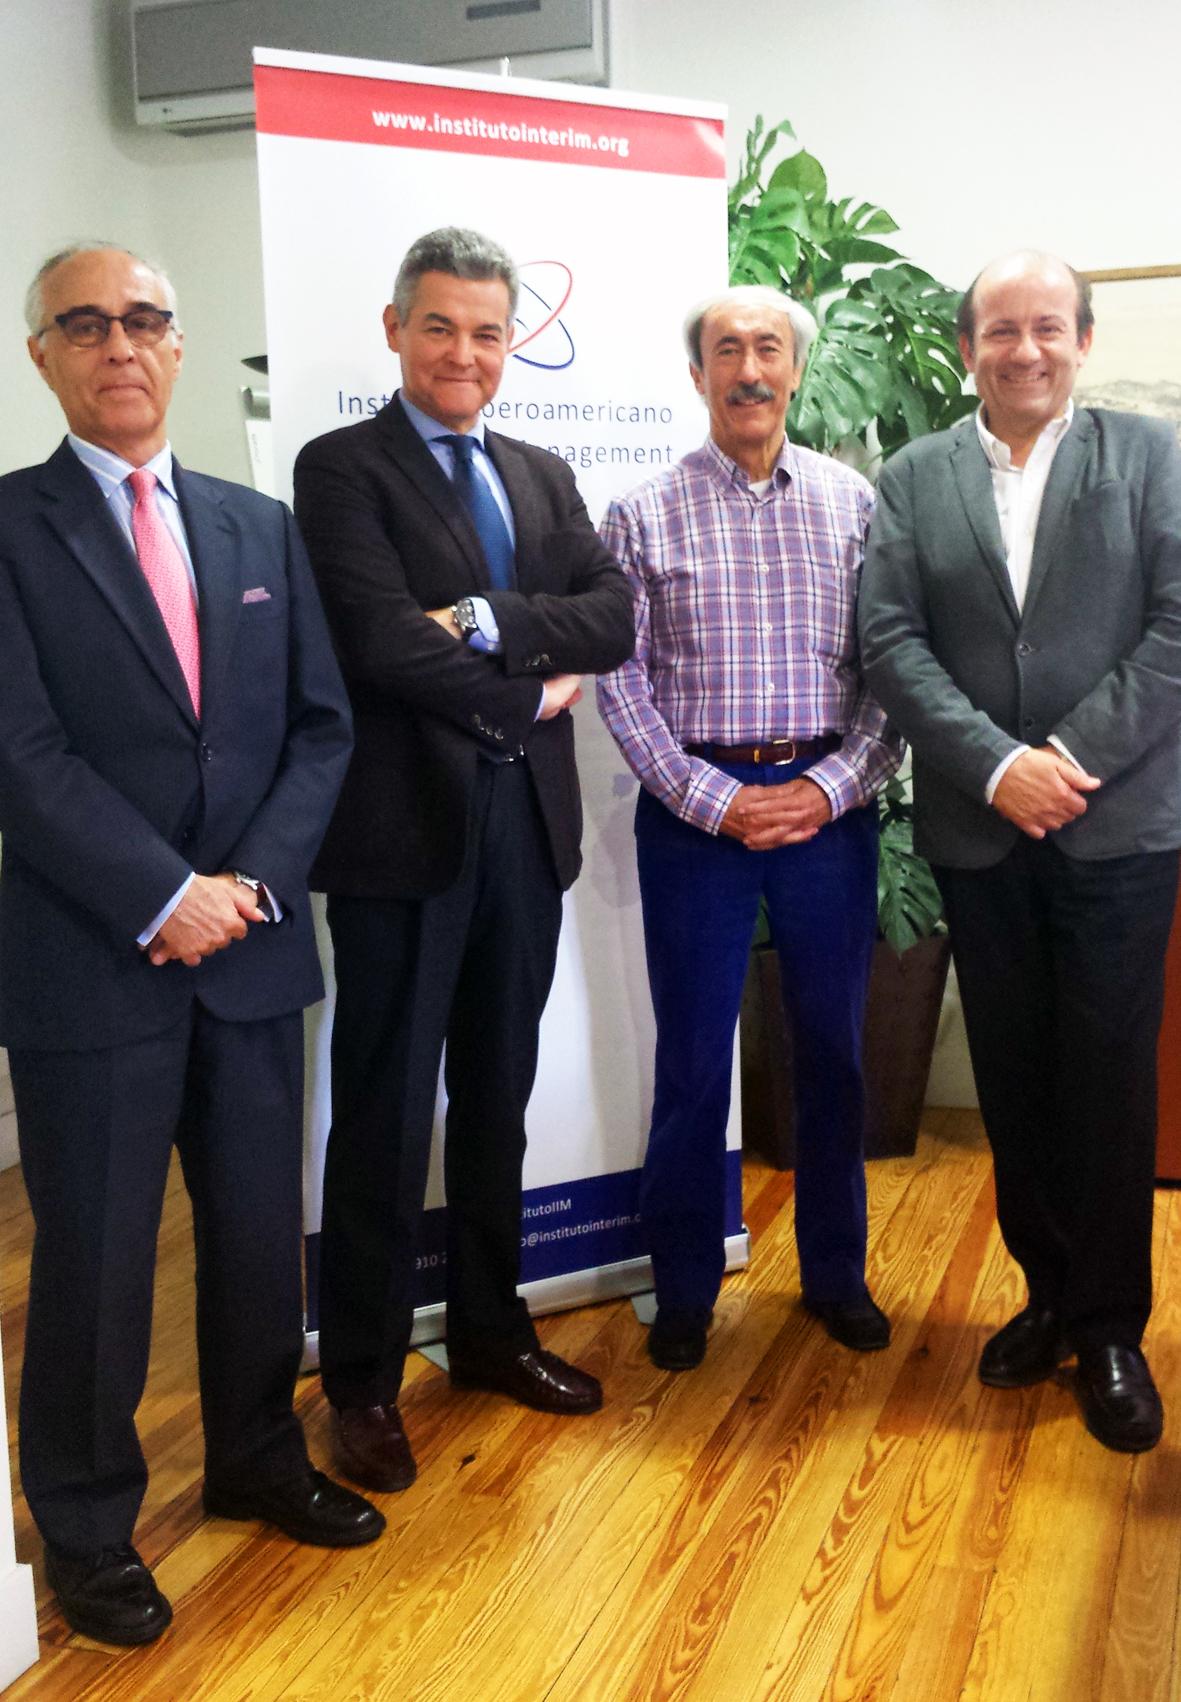 Acuerdo de colaboración: Instituto Iberoamericano de Interim Management & SLNE